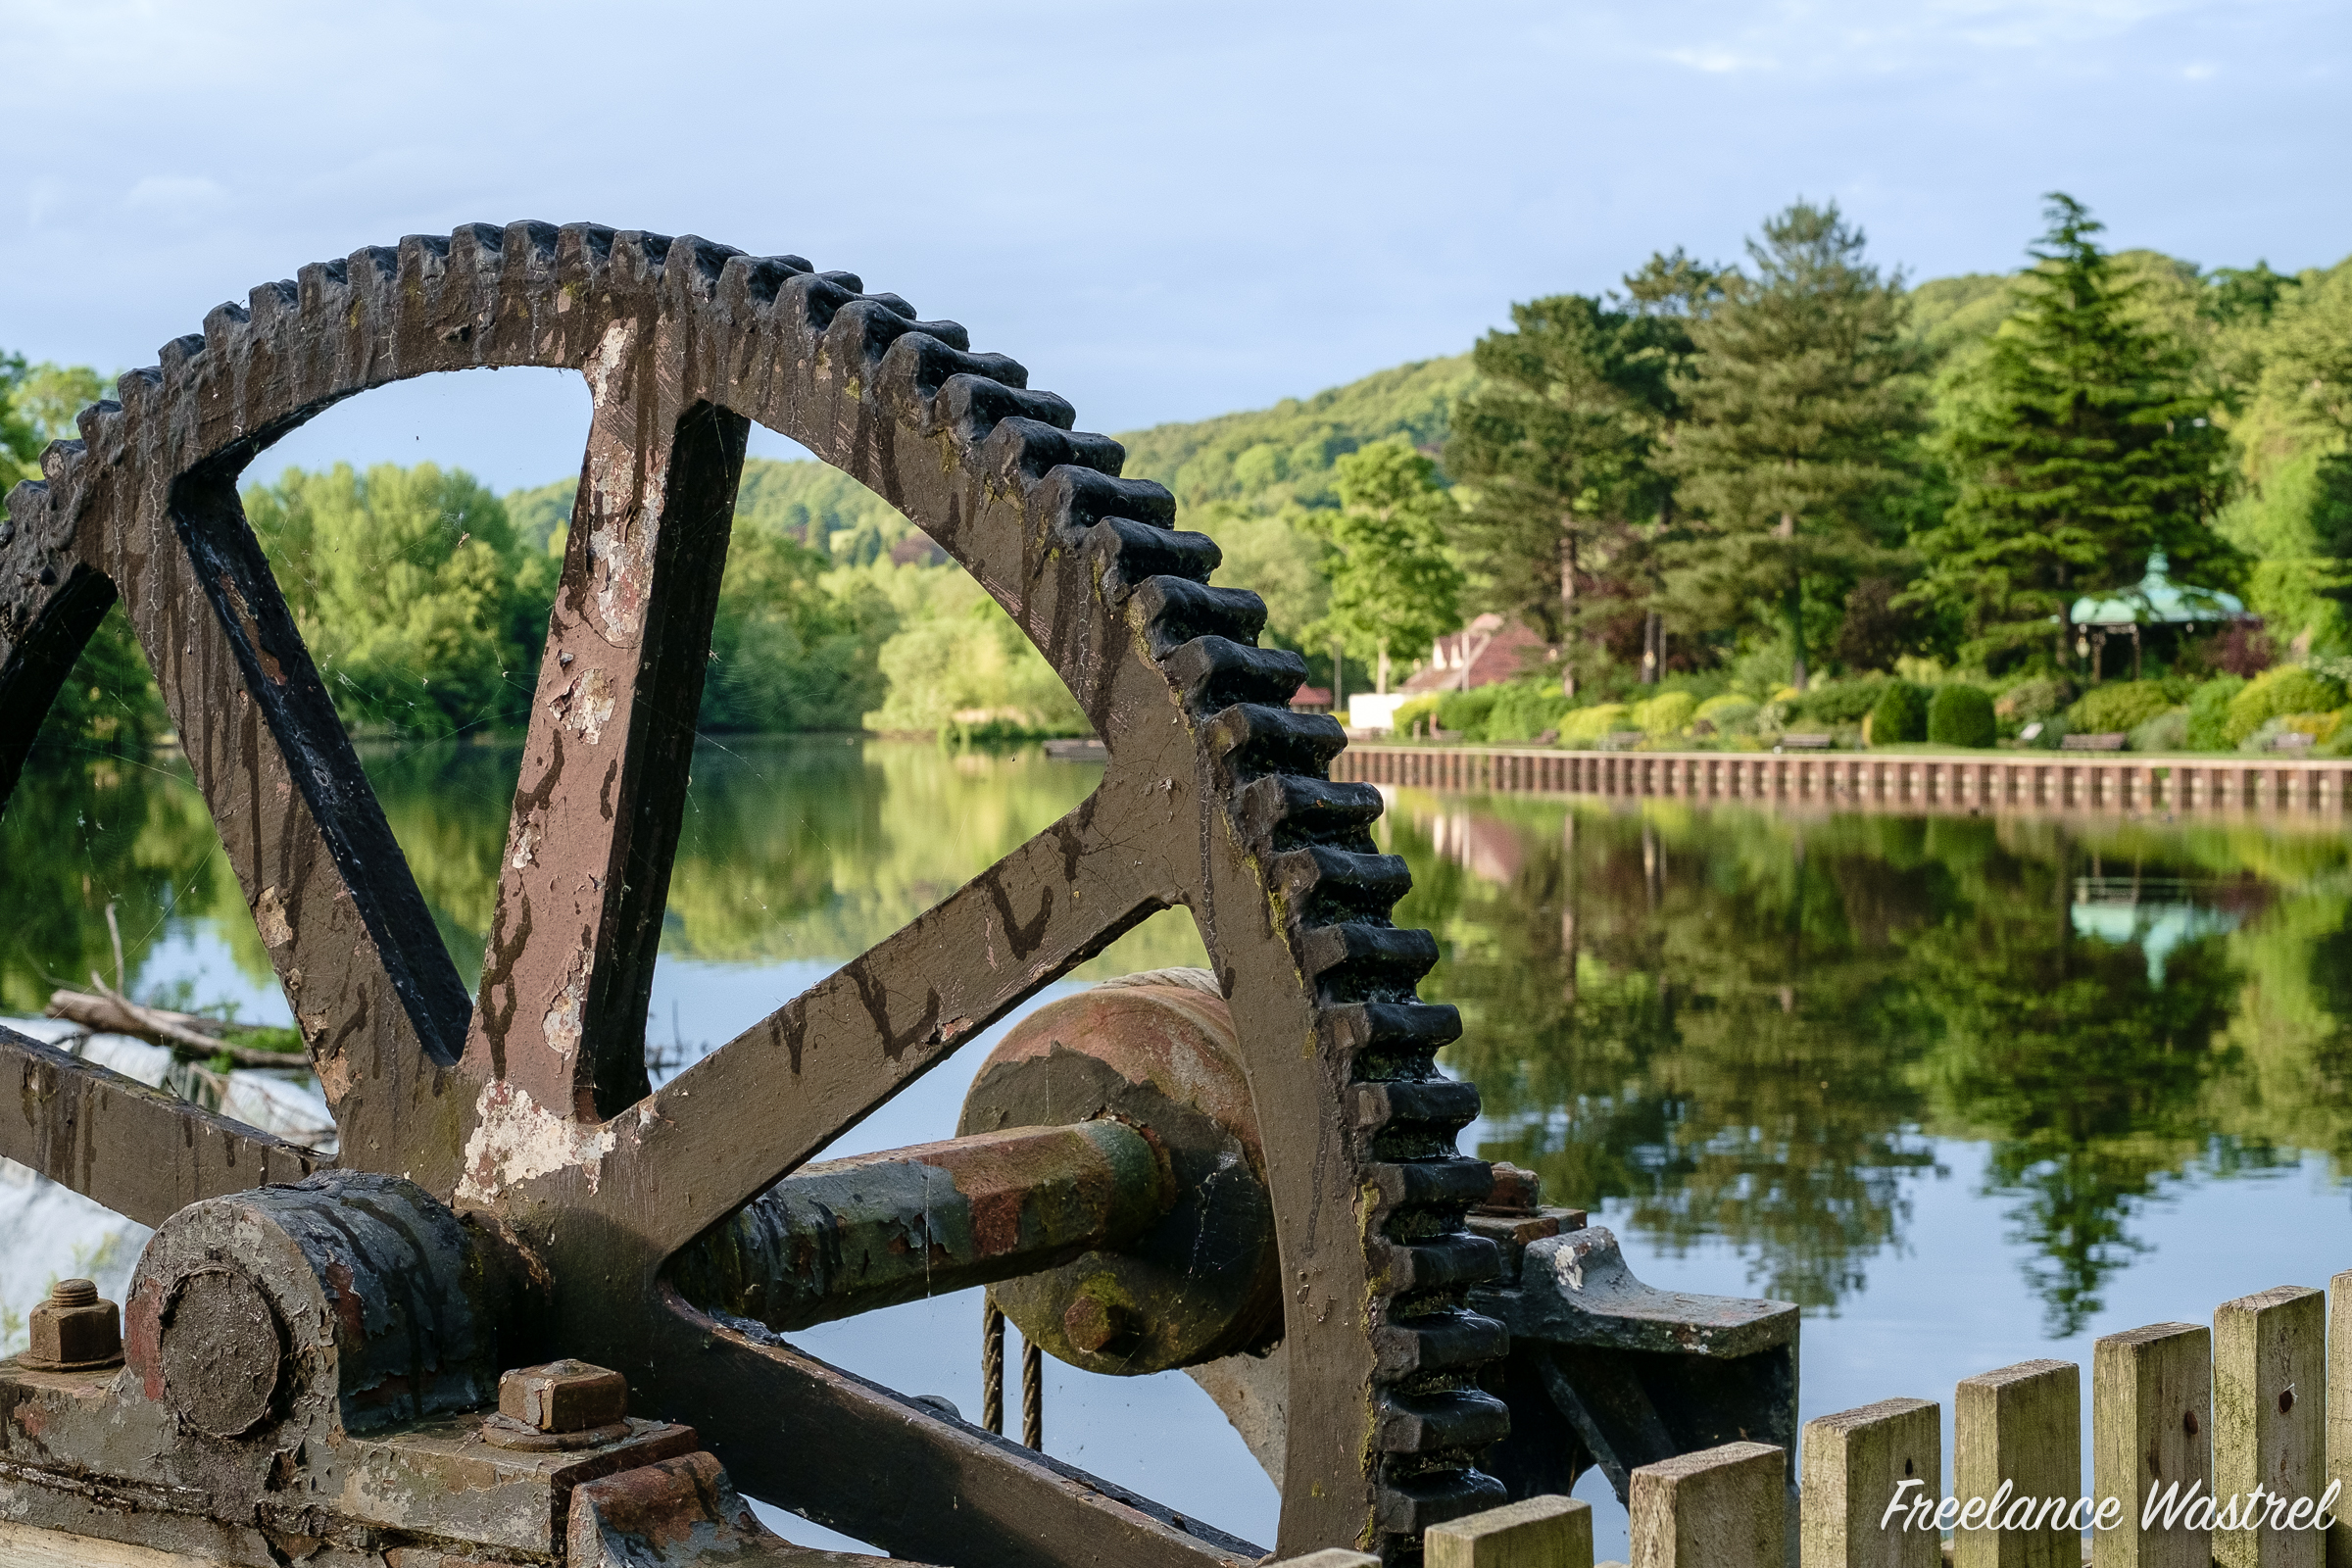 Sluice gate machinery, Belper North Mill